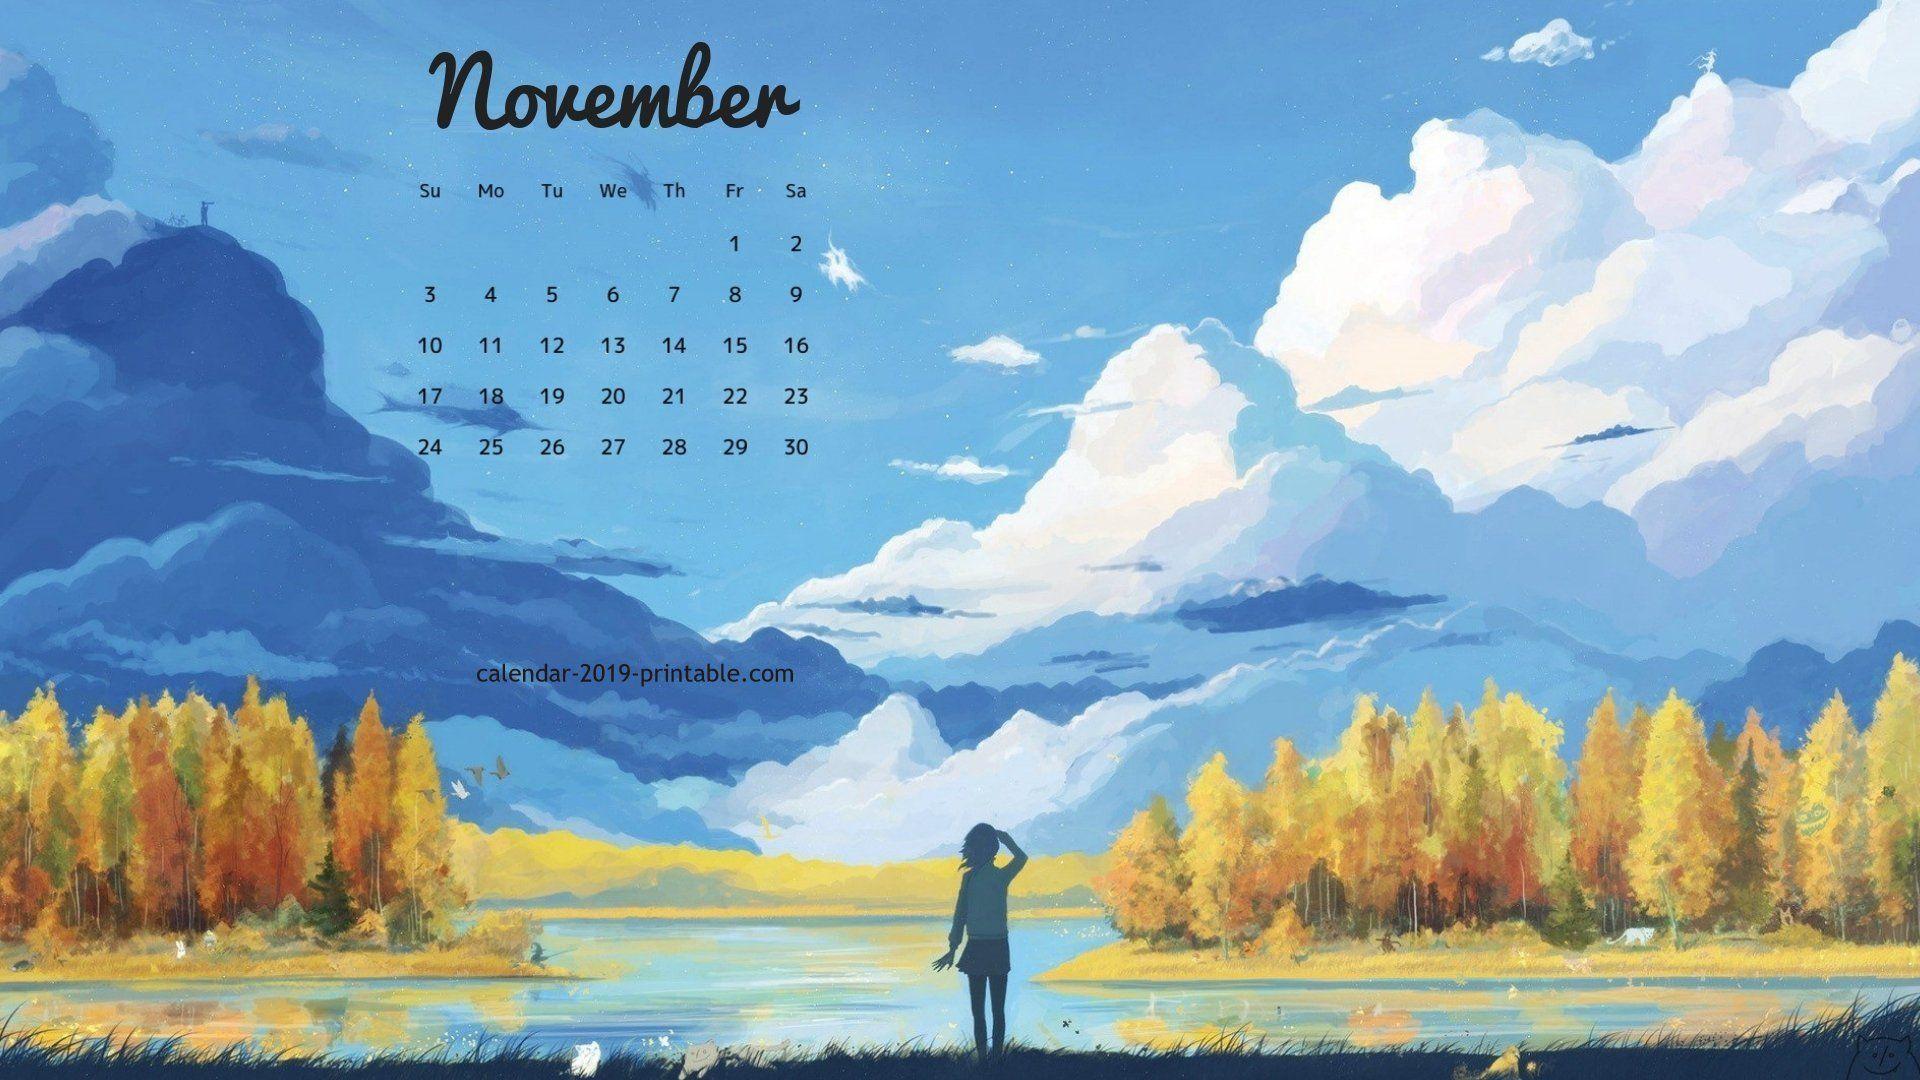 2019 calendar hd images